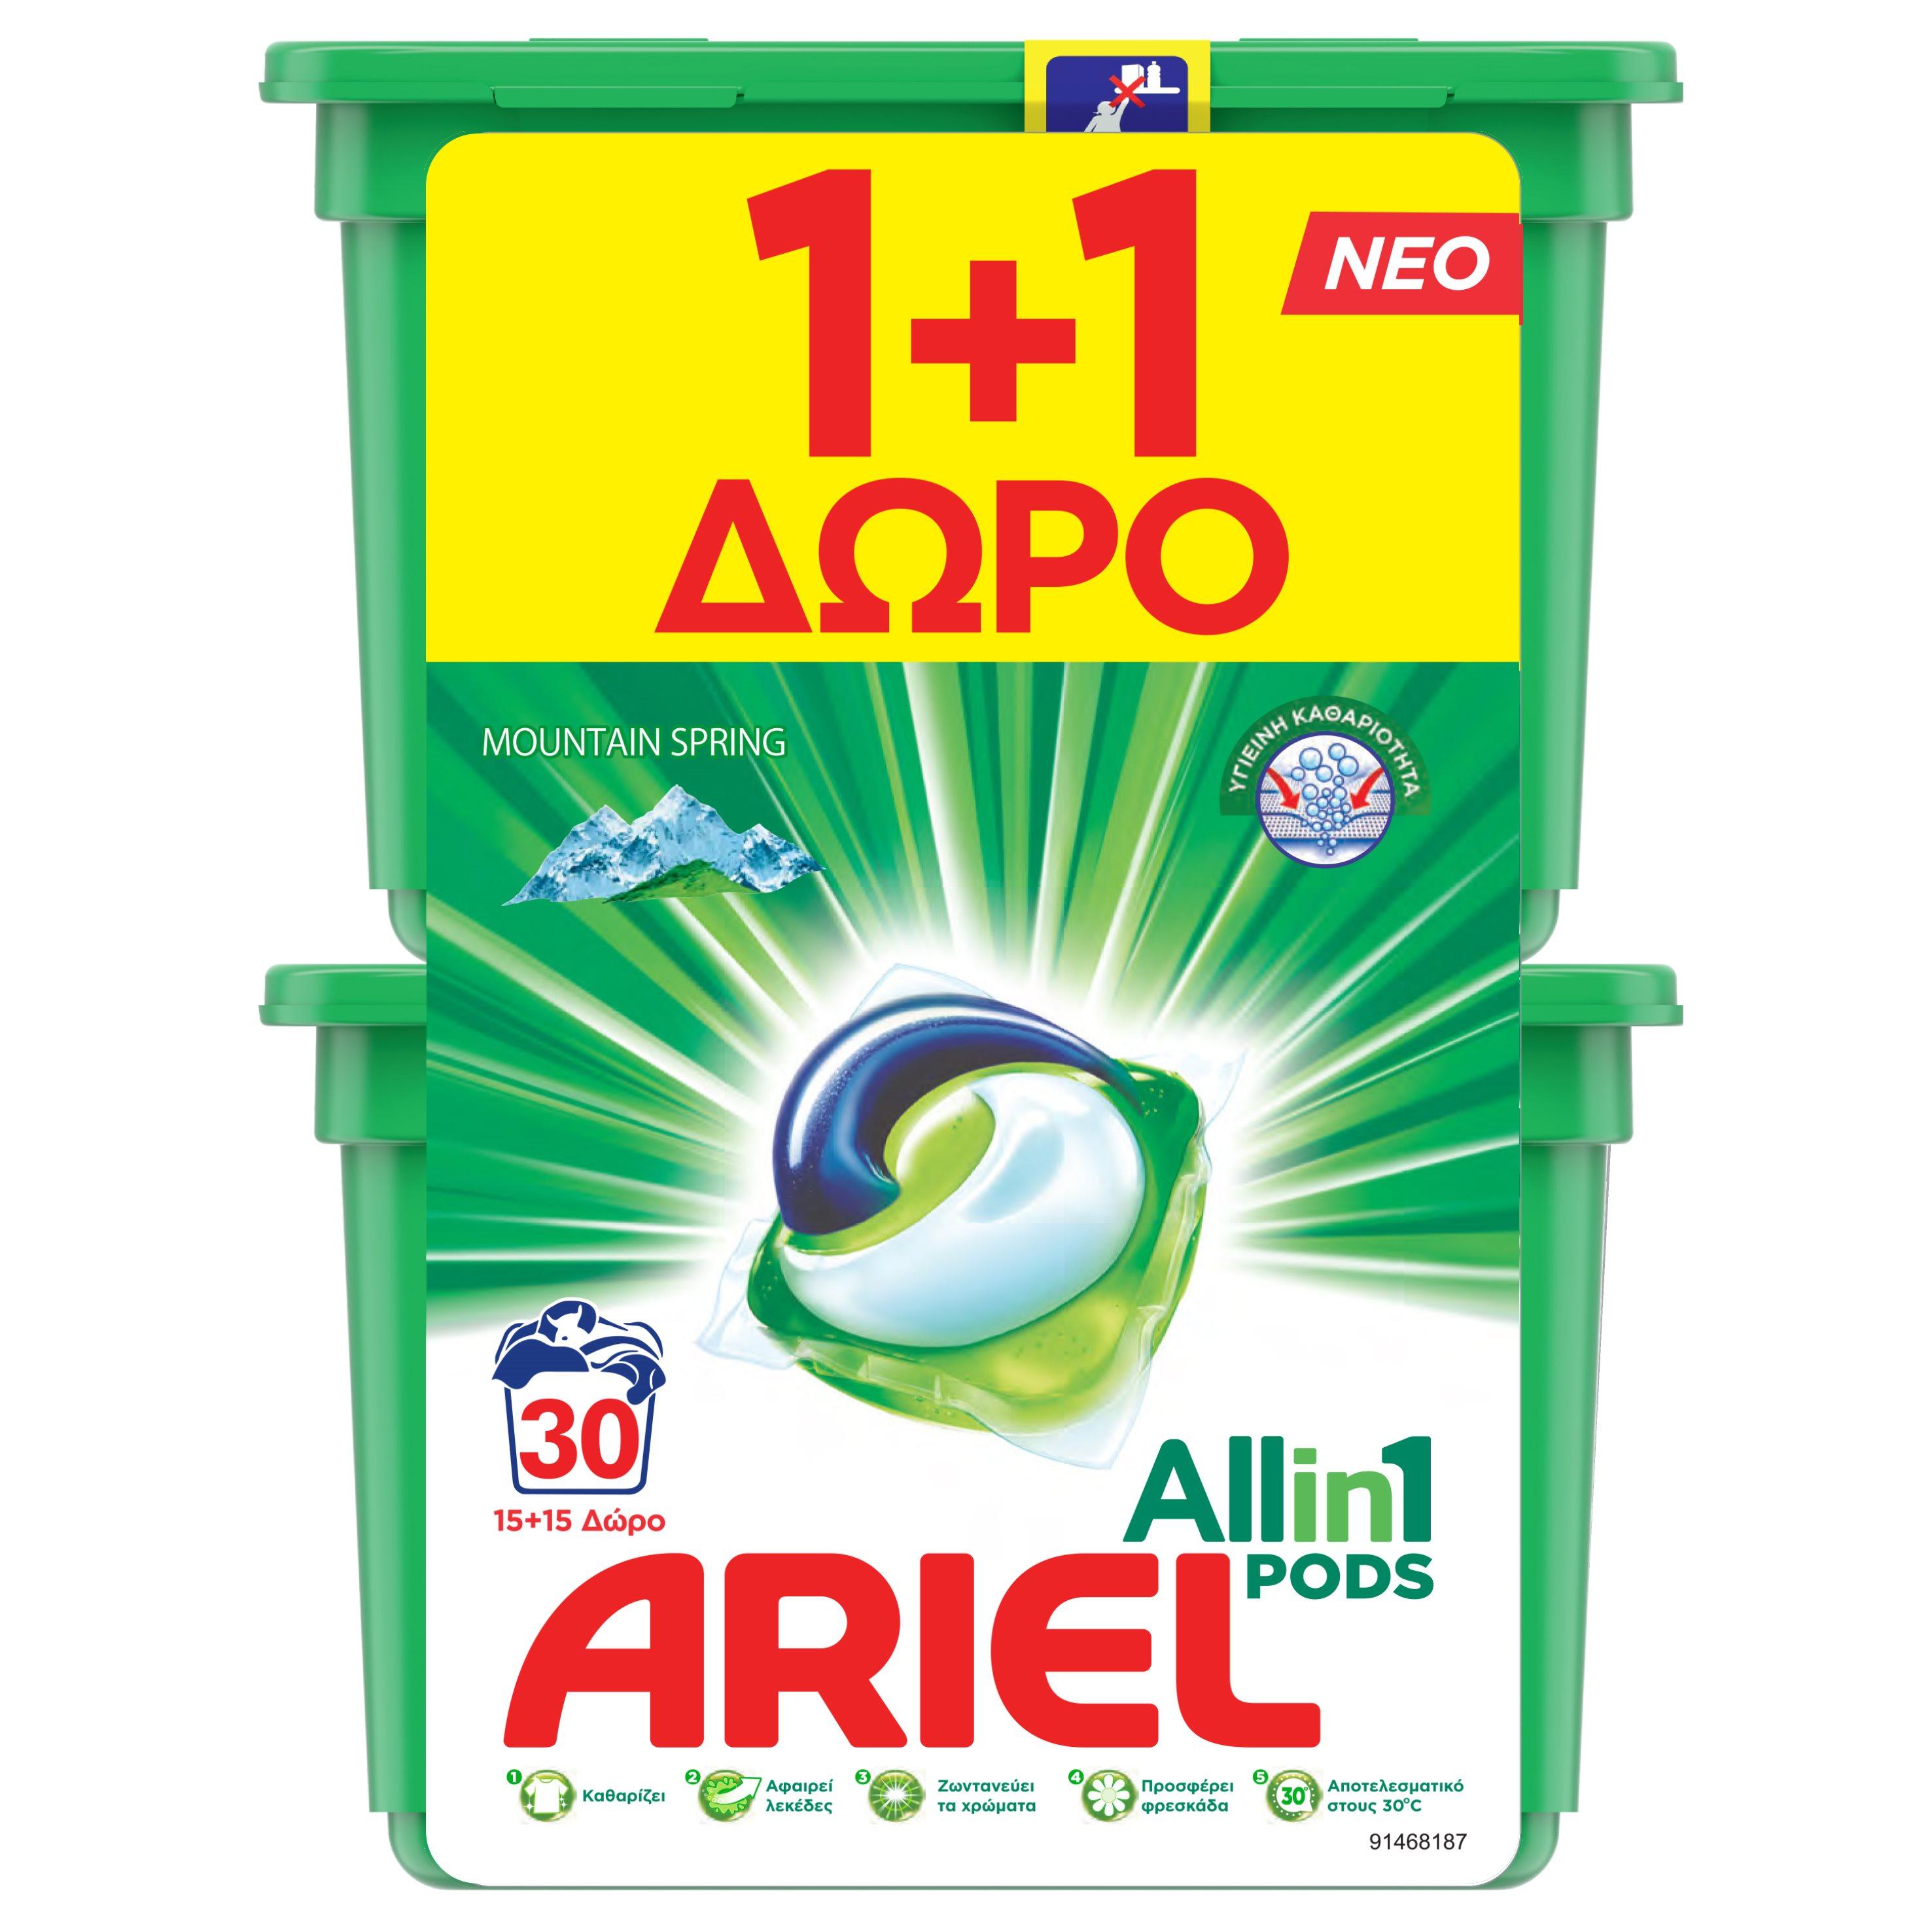 Ariel Allin1 PODS Mountain Spring 30 Κάψουλες - 15 Κάψουλες + 15 Κάψουλες δώρο (1+1 δώρο) - 817